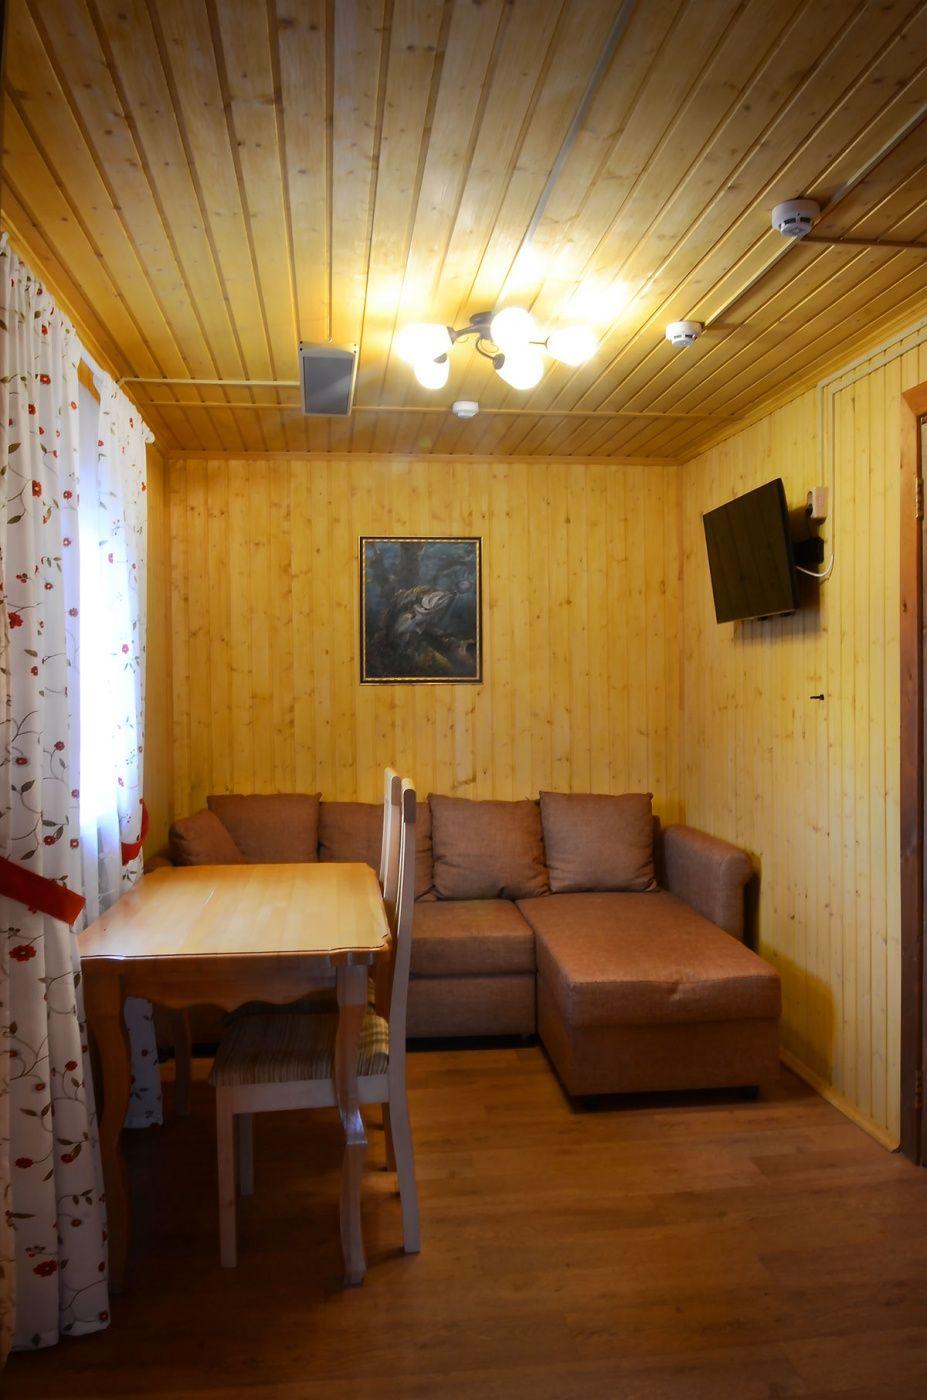 Резиденция Комфорта «Family Fishing» Краснодарский край Дом №5,6, фото 4